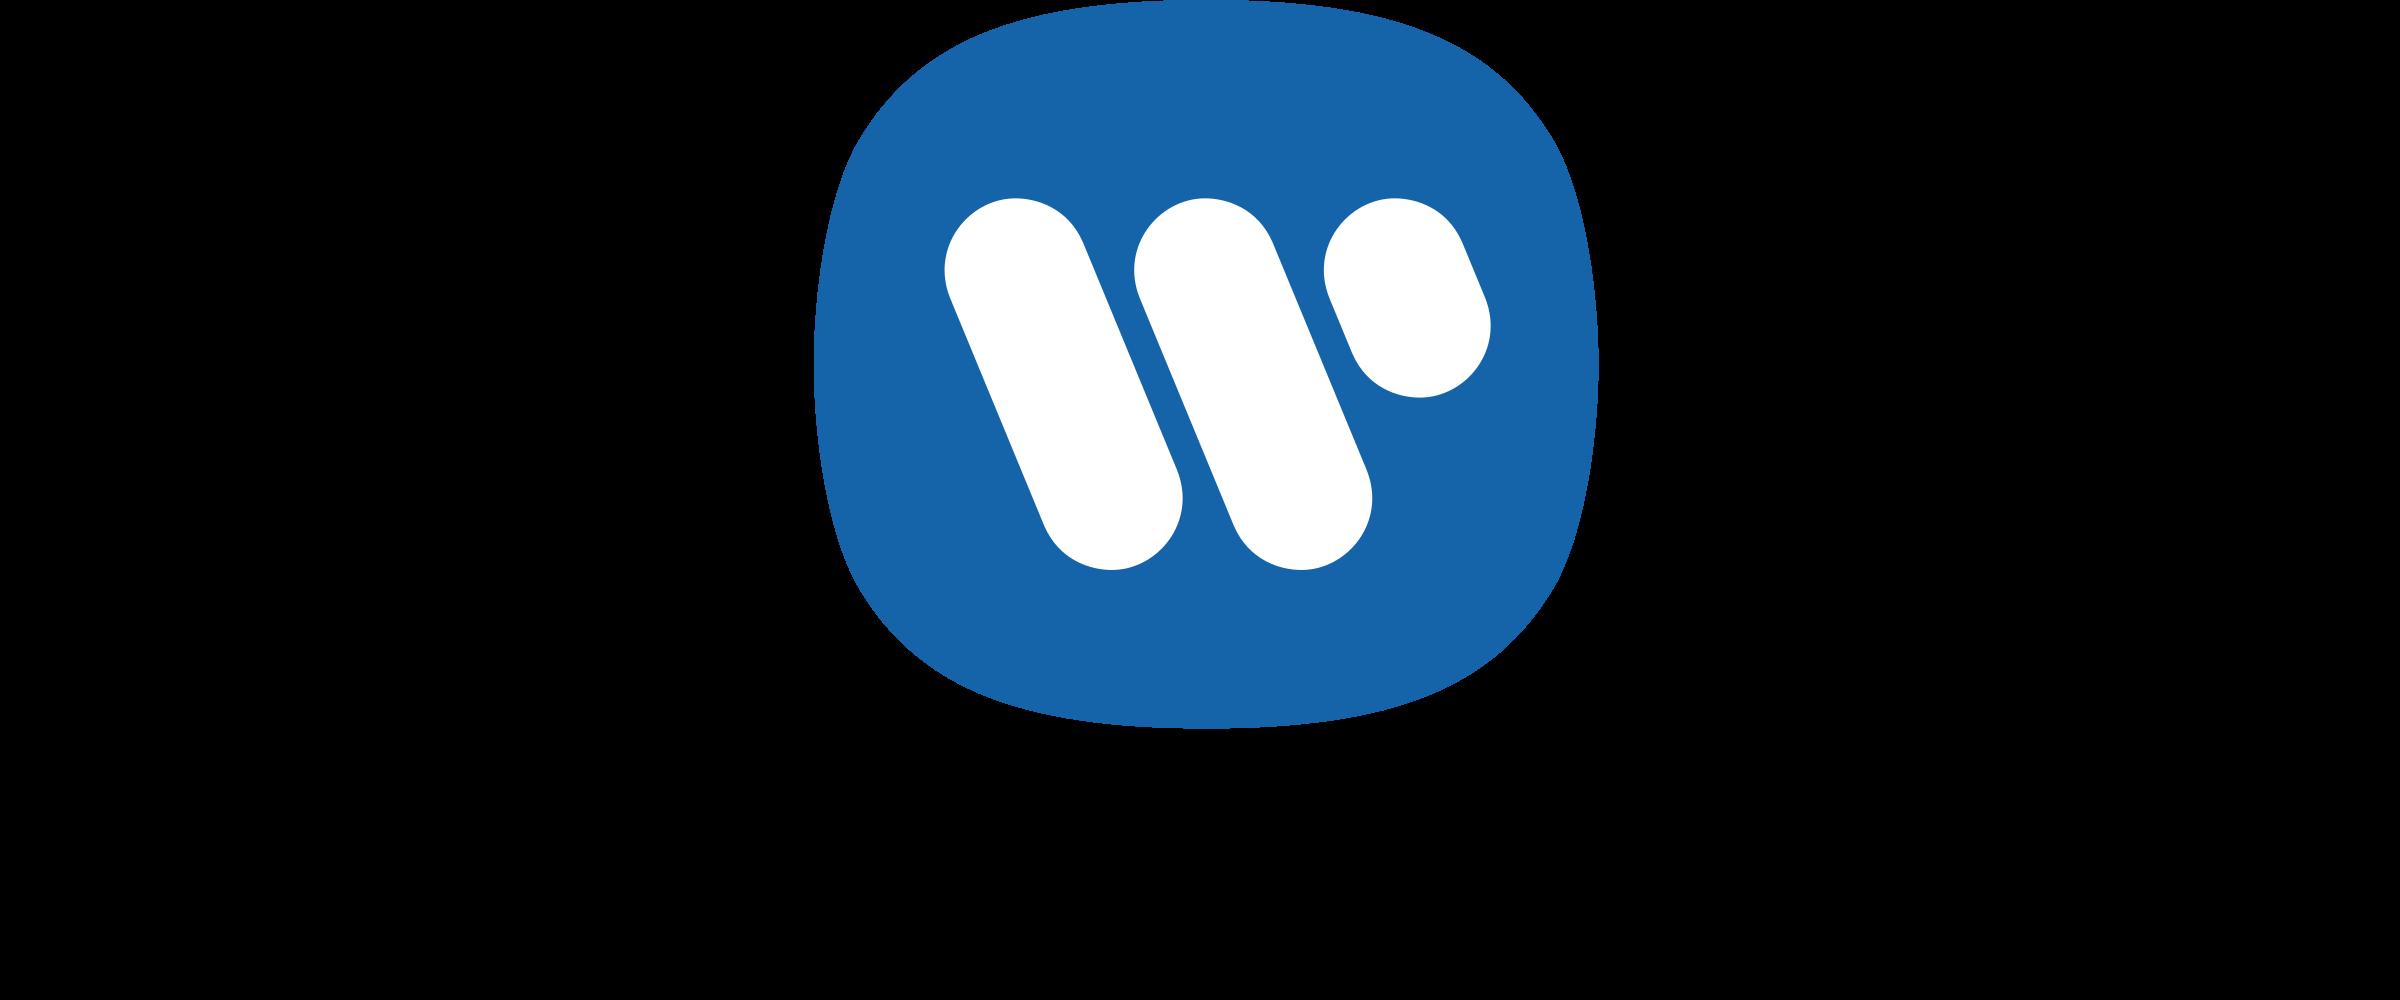 warner-music-group-wmg-logo-png-transpar